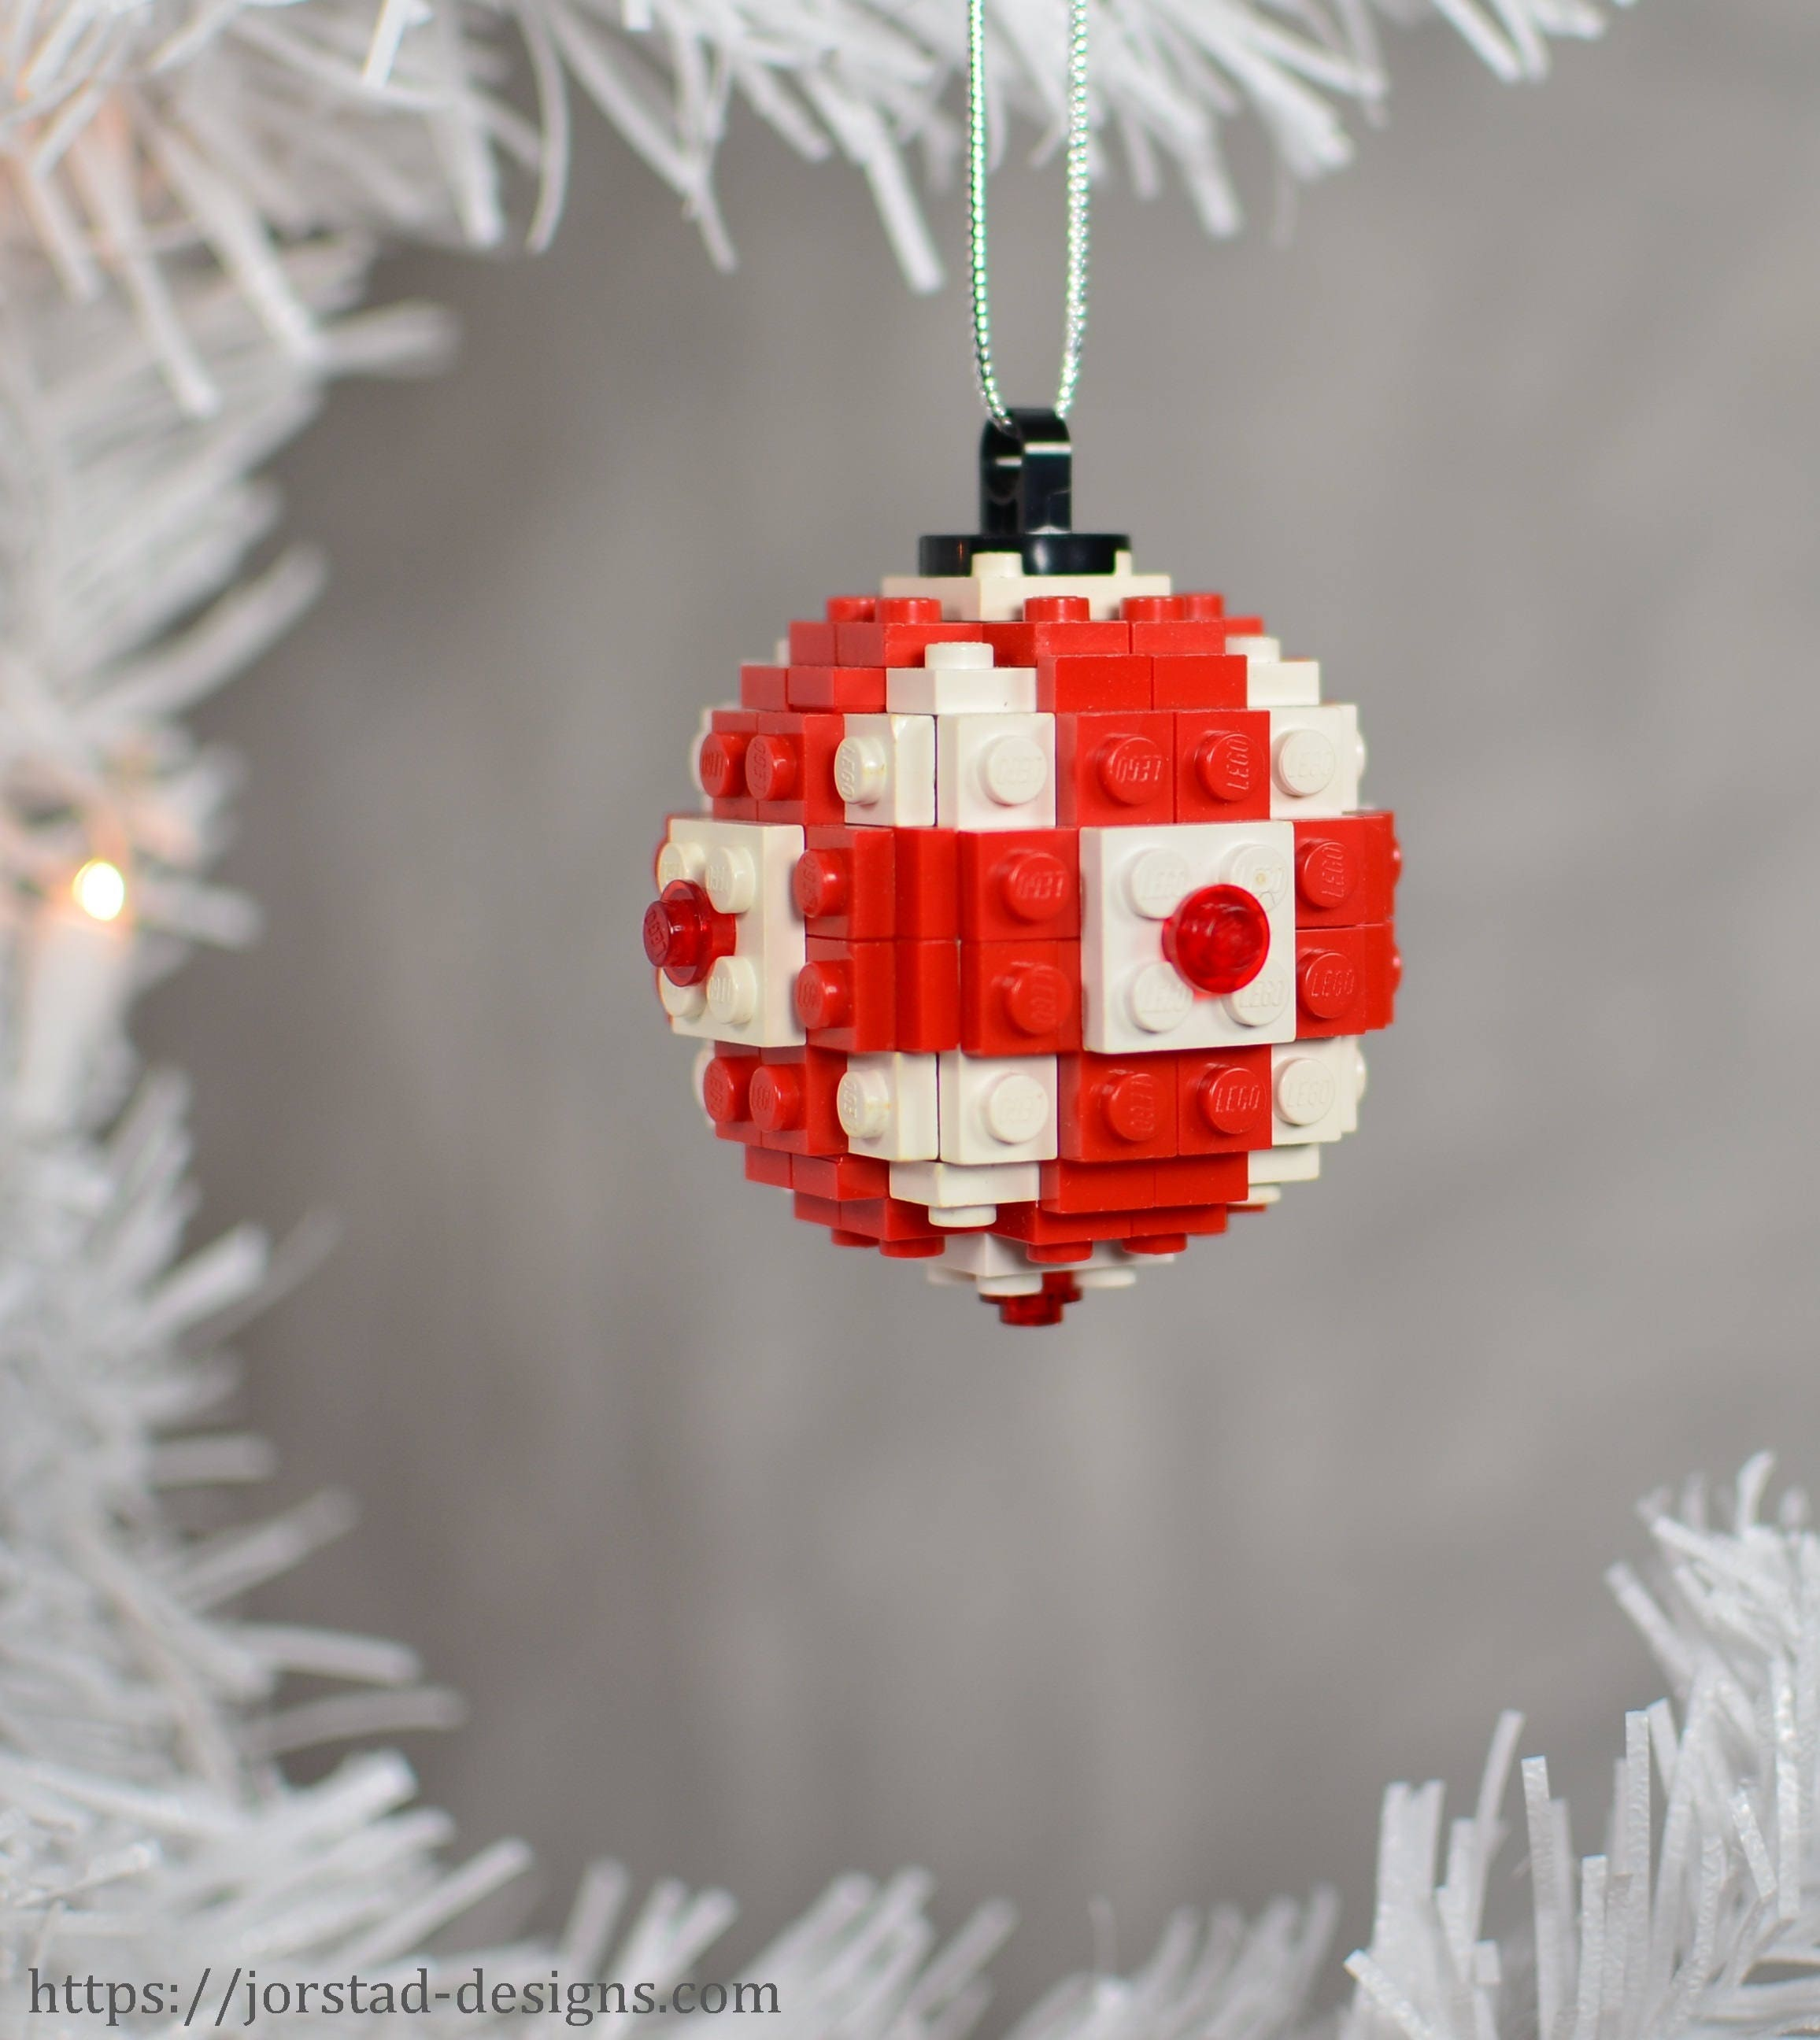 Lego Christmas Ornament Globe